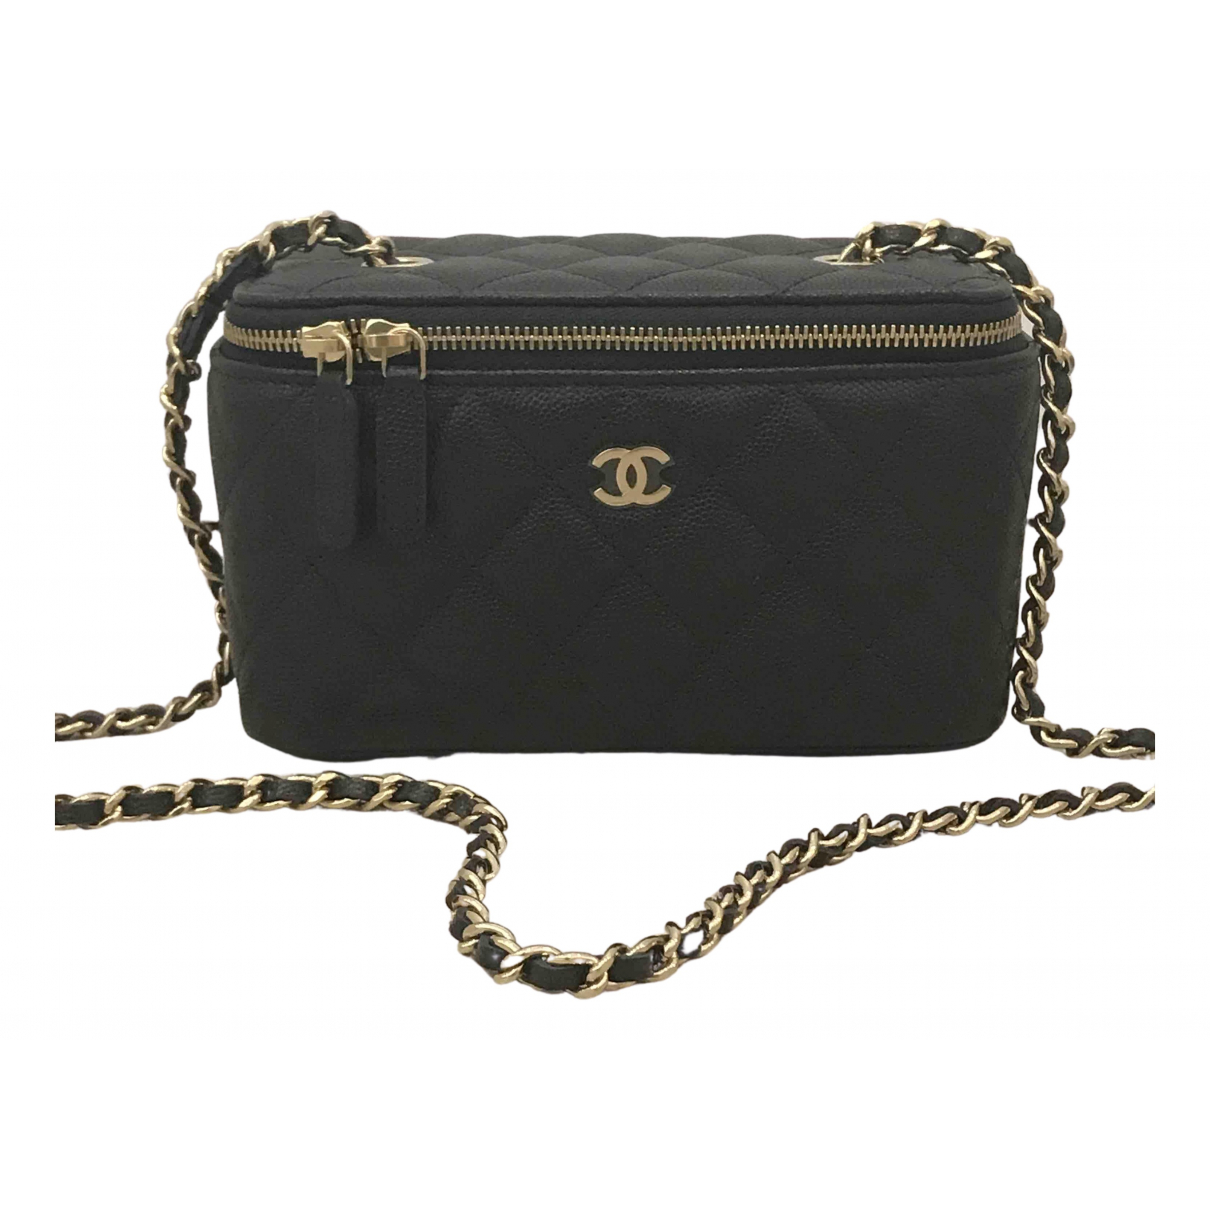 Chanel Vanity Navy Leather handbag for Women N